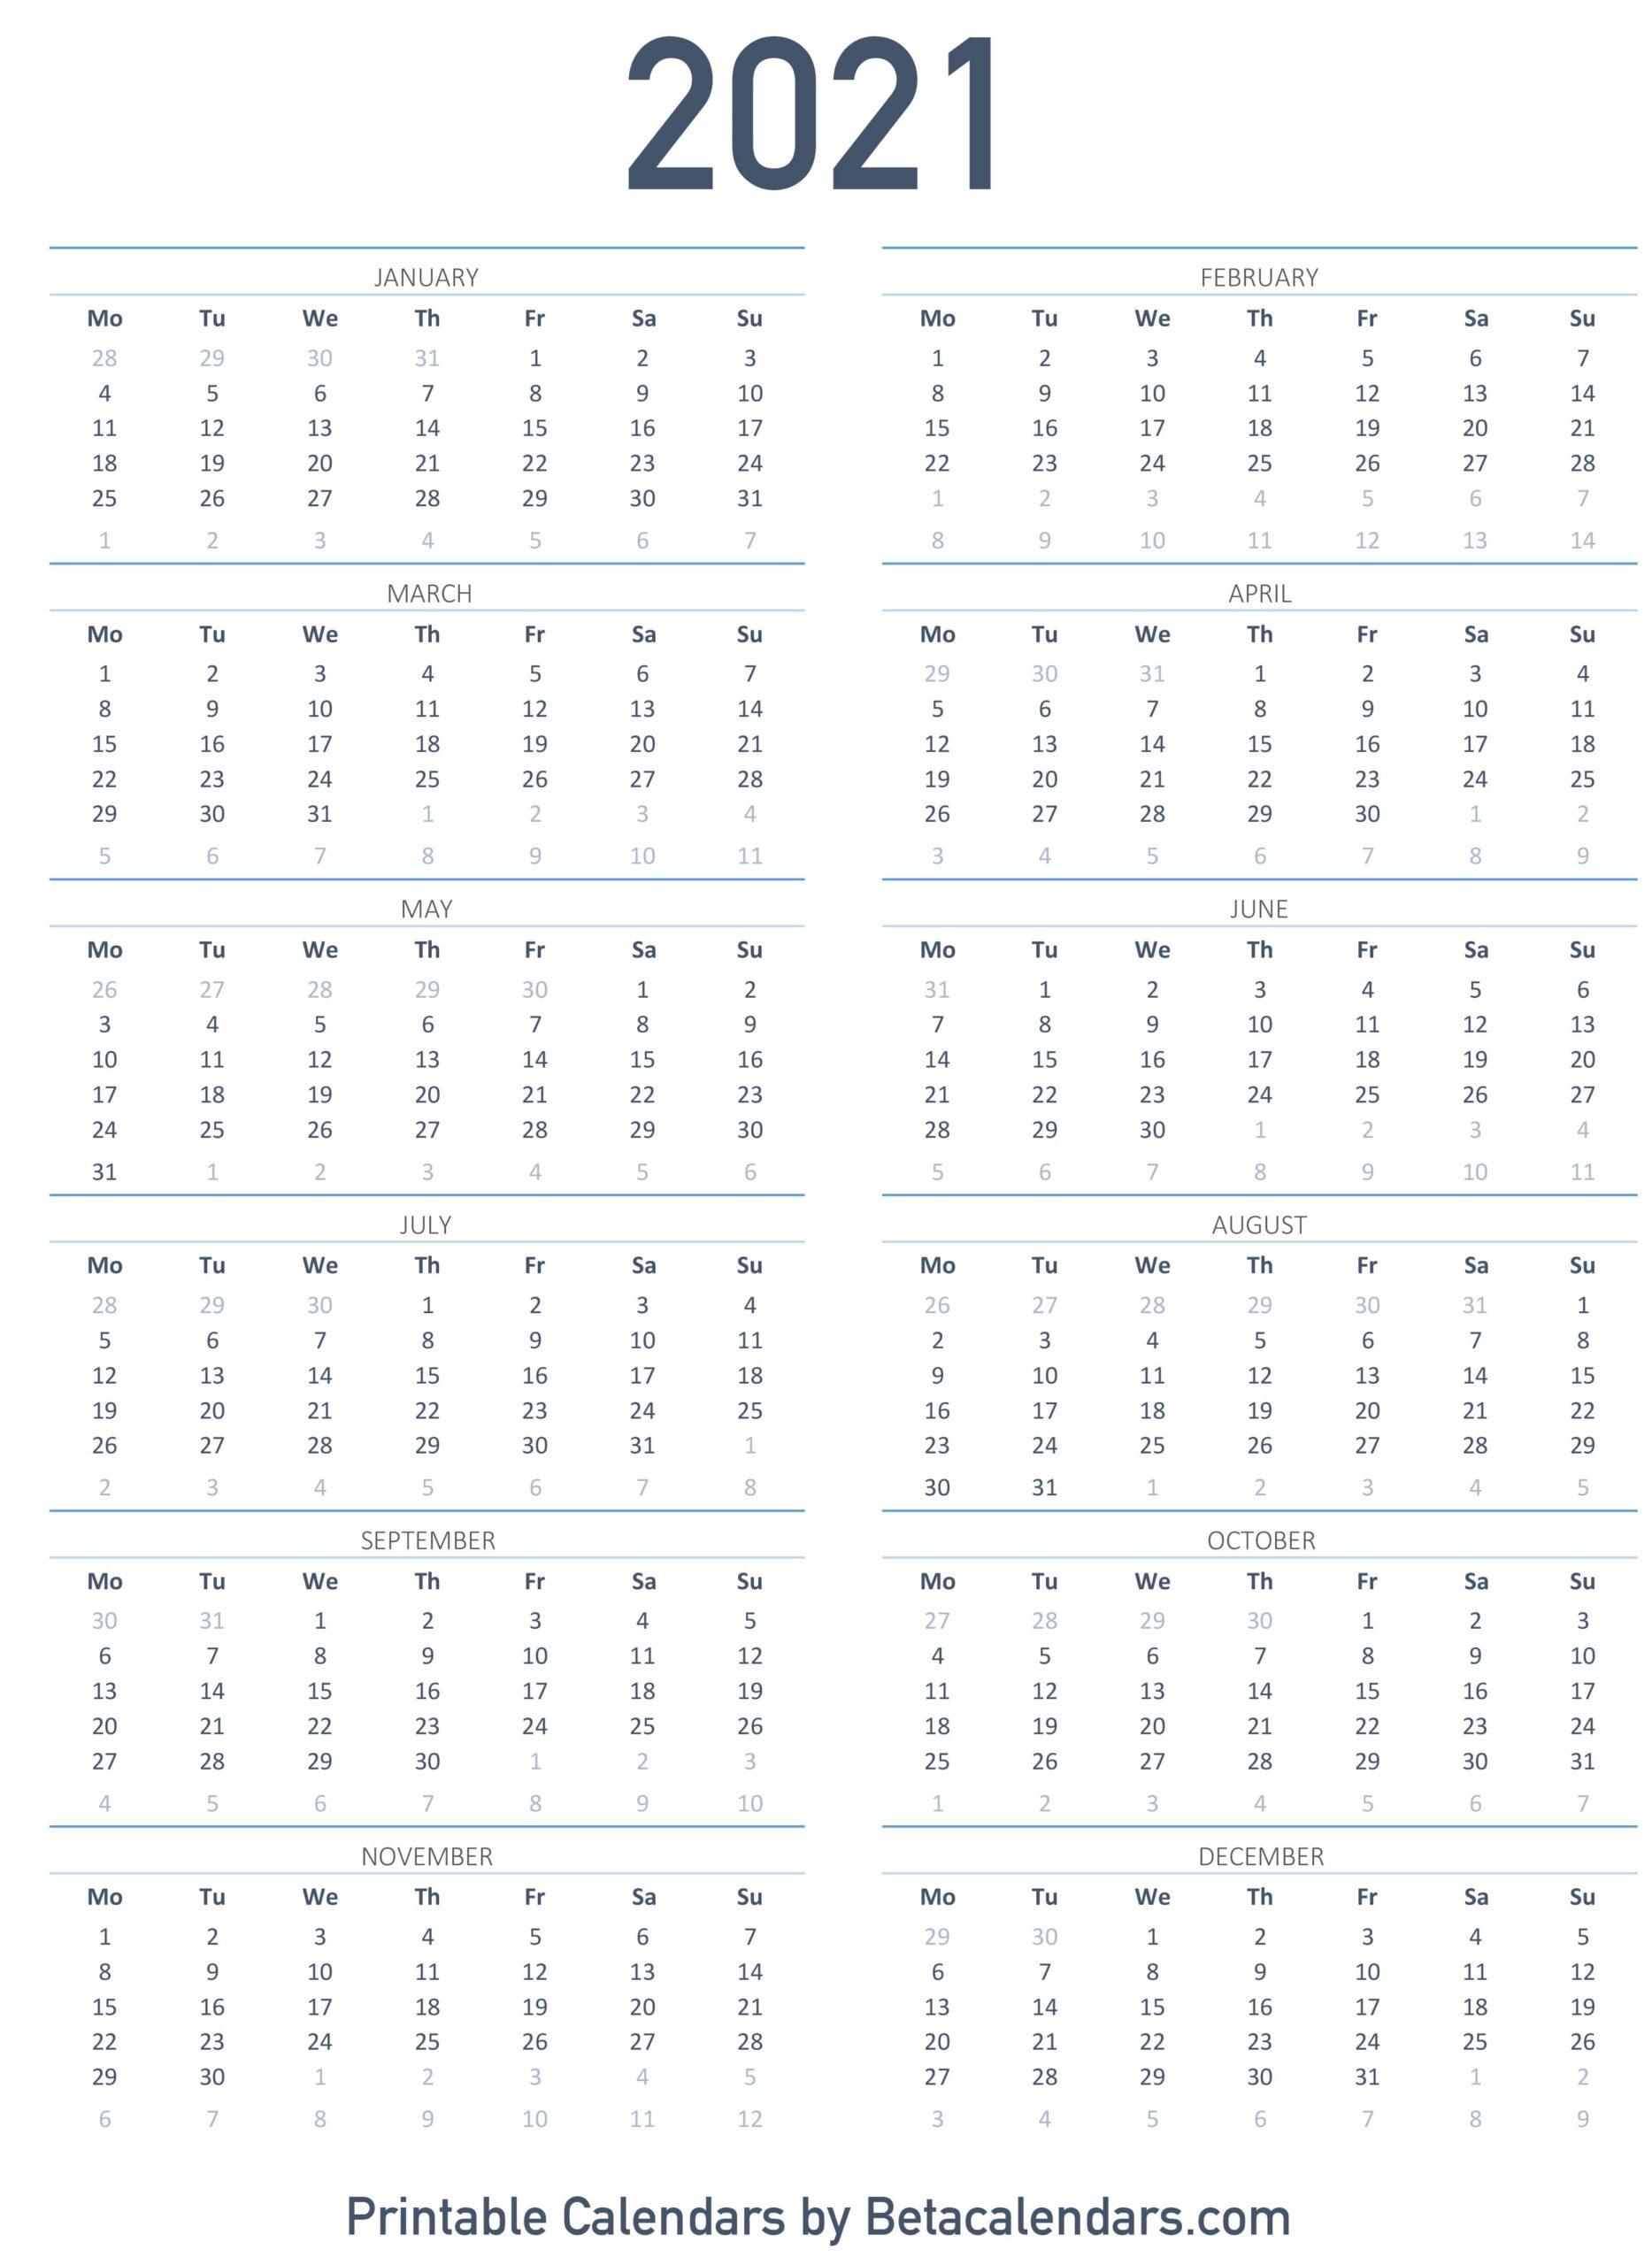 2021 Calendar Printable